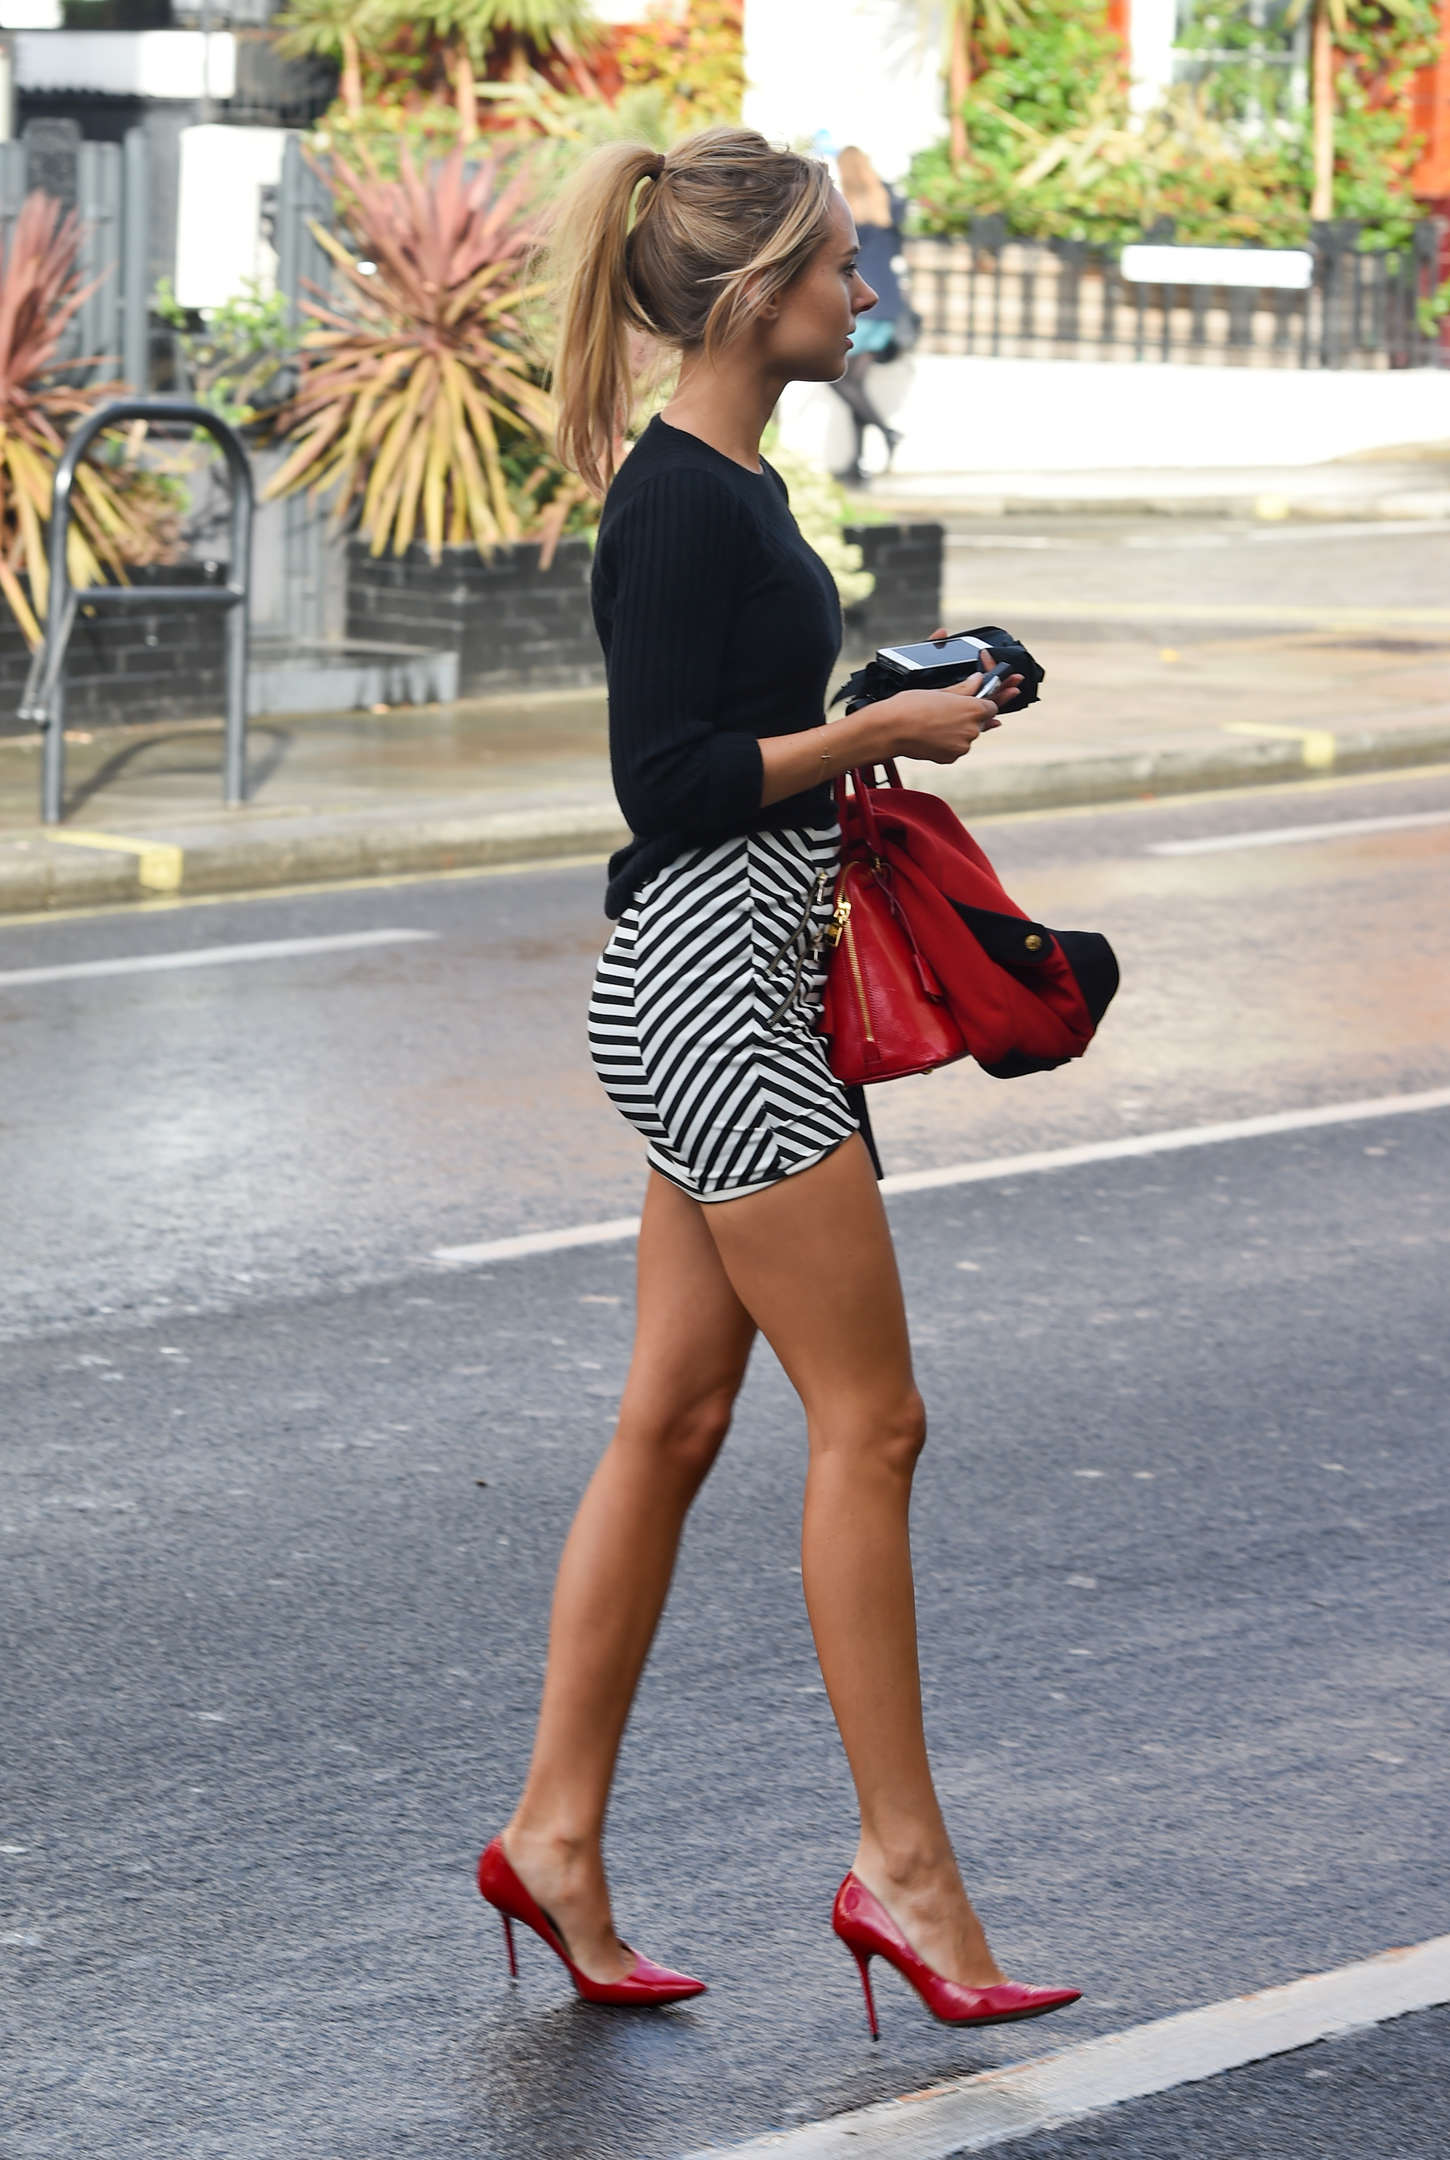 Kimberley Garner in Tight Mini Skirt -27 - GotCeleb